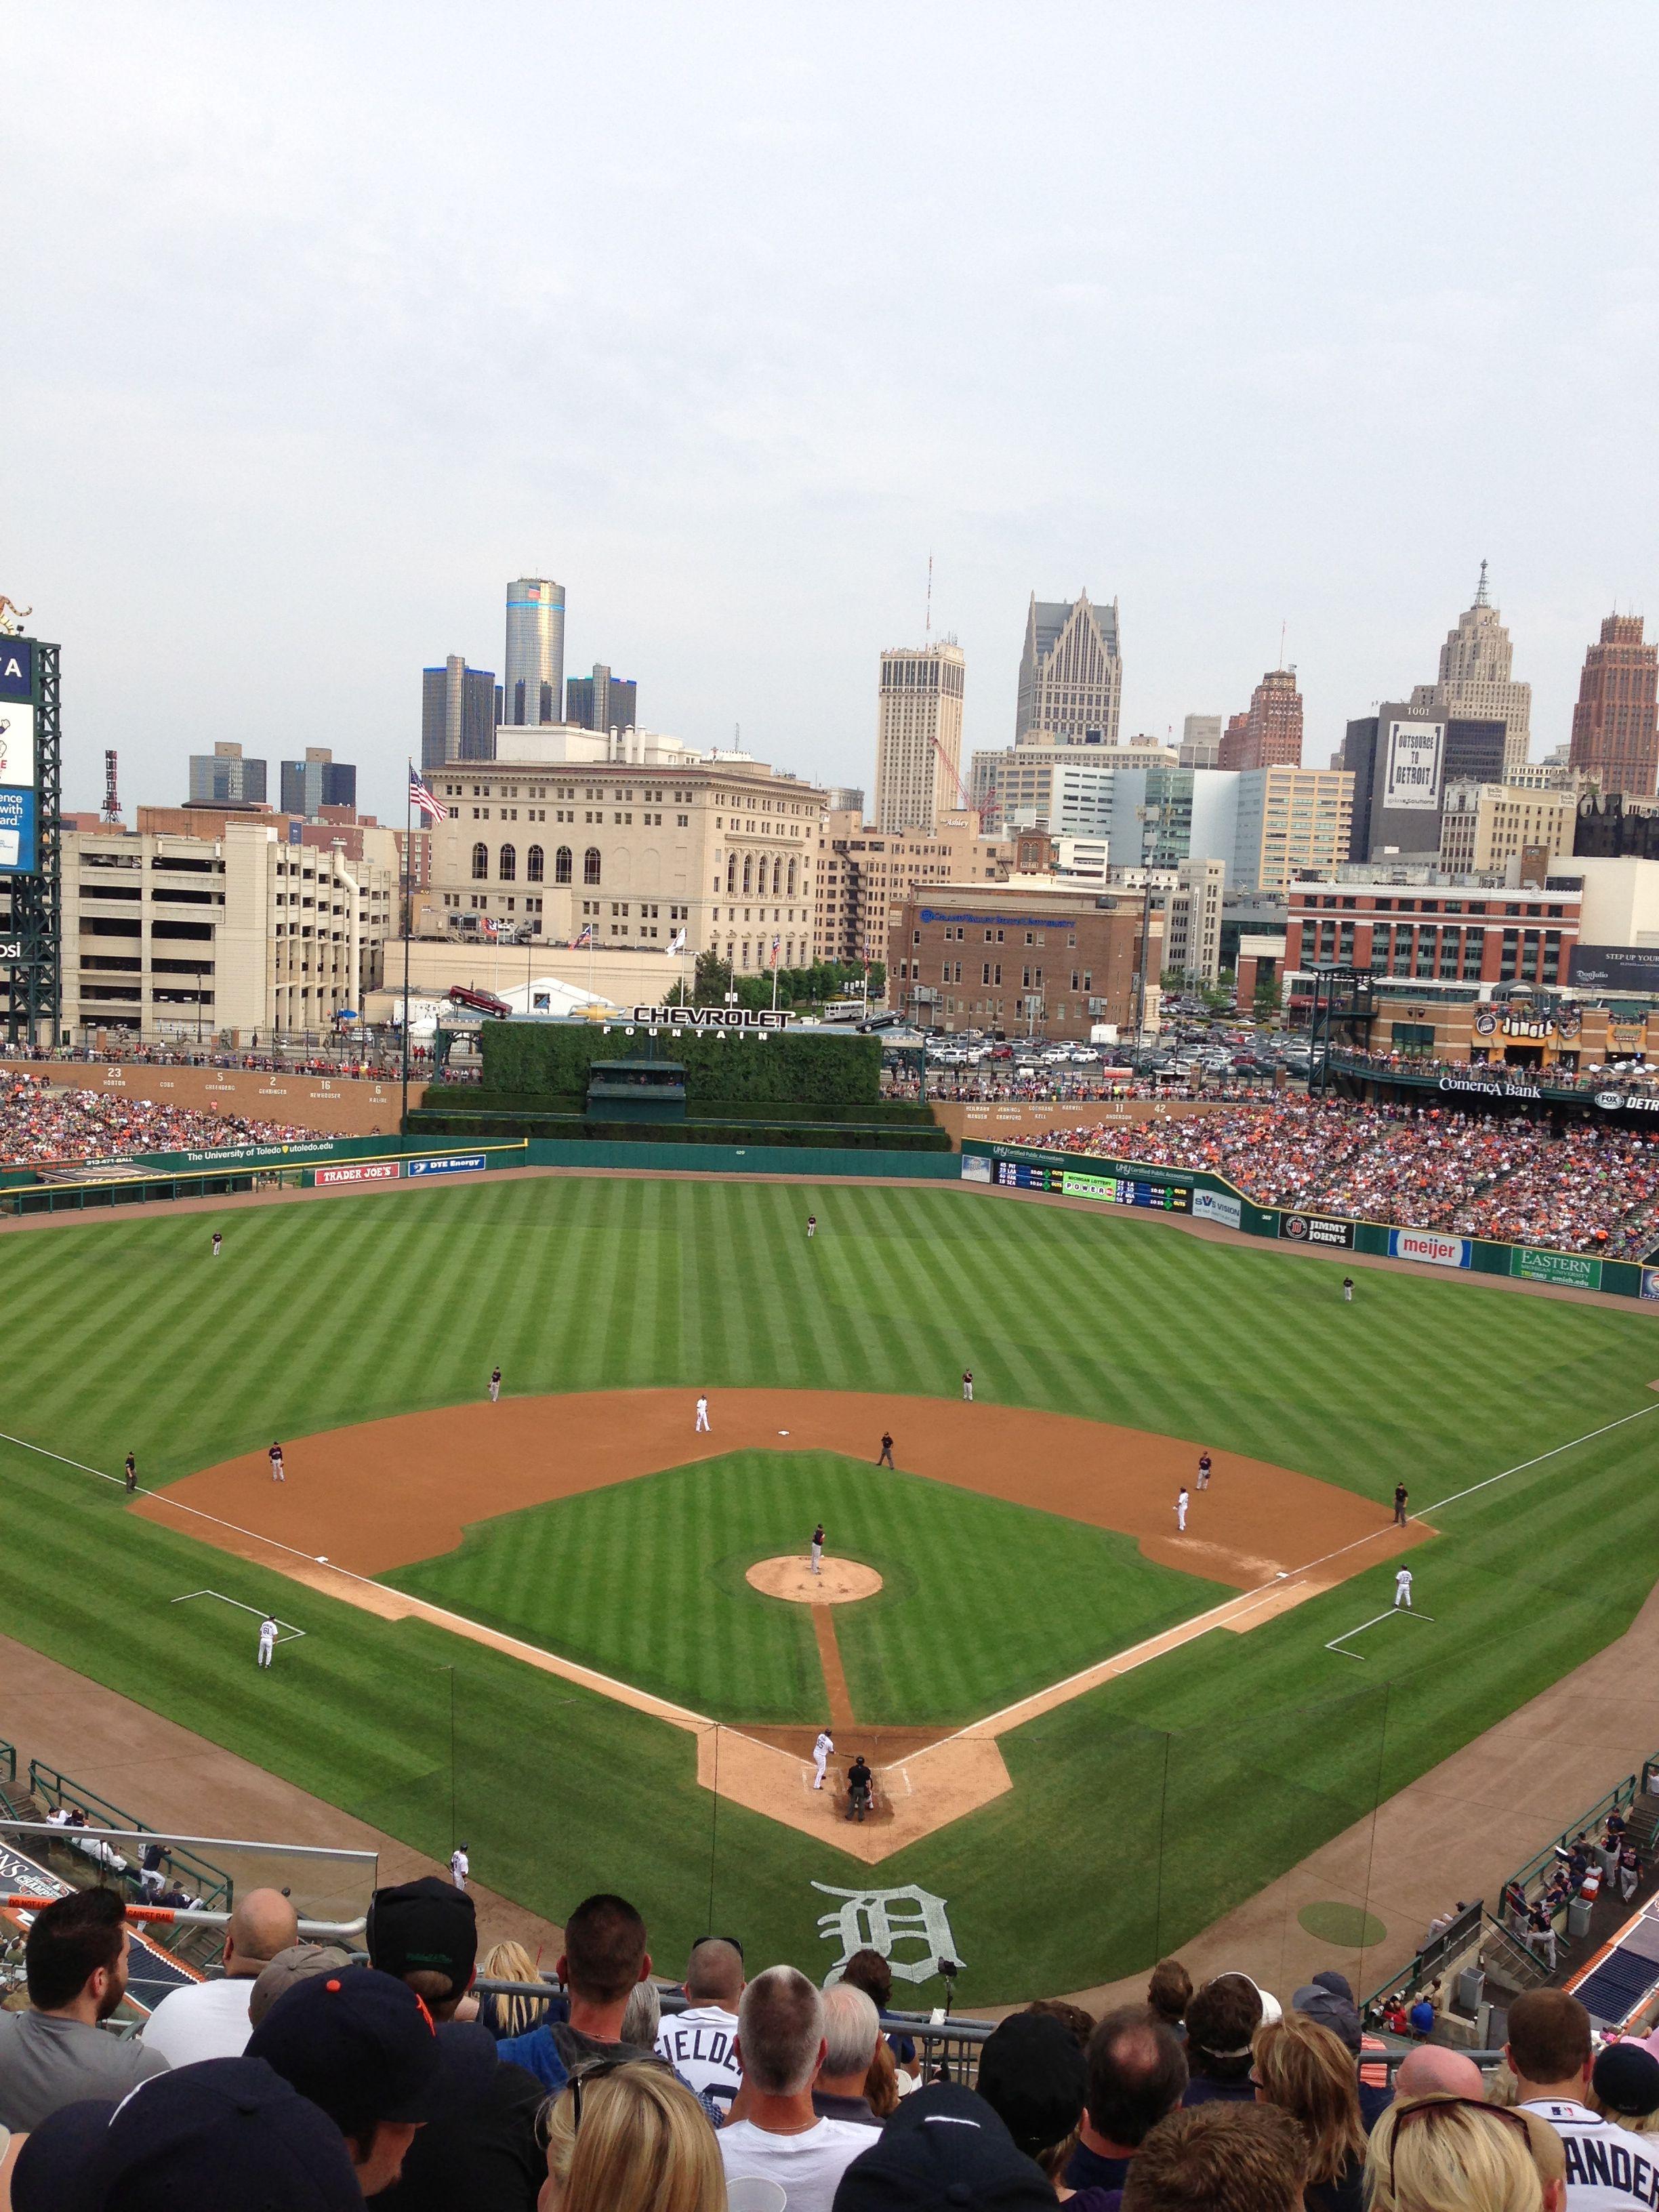 Tigers baseball field sports pinterest tigers baseball field malvernweather Images